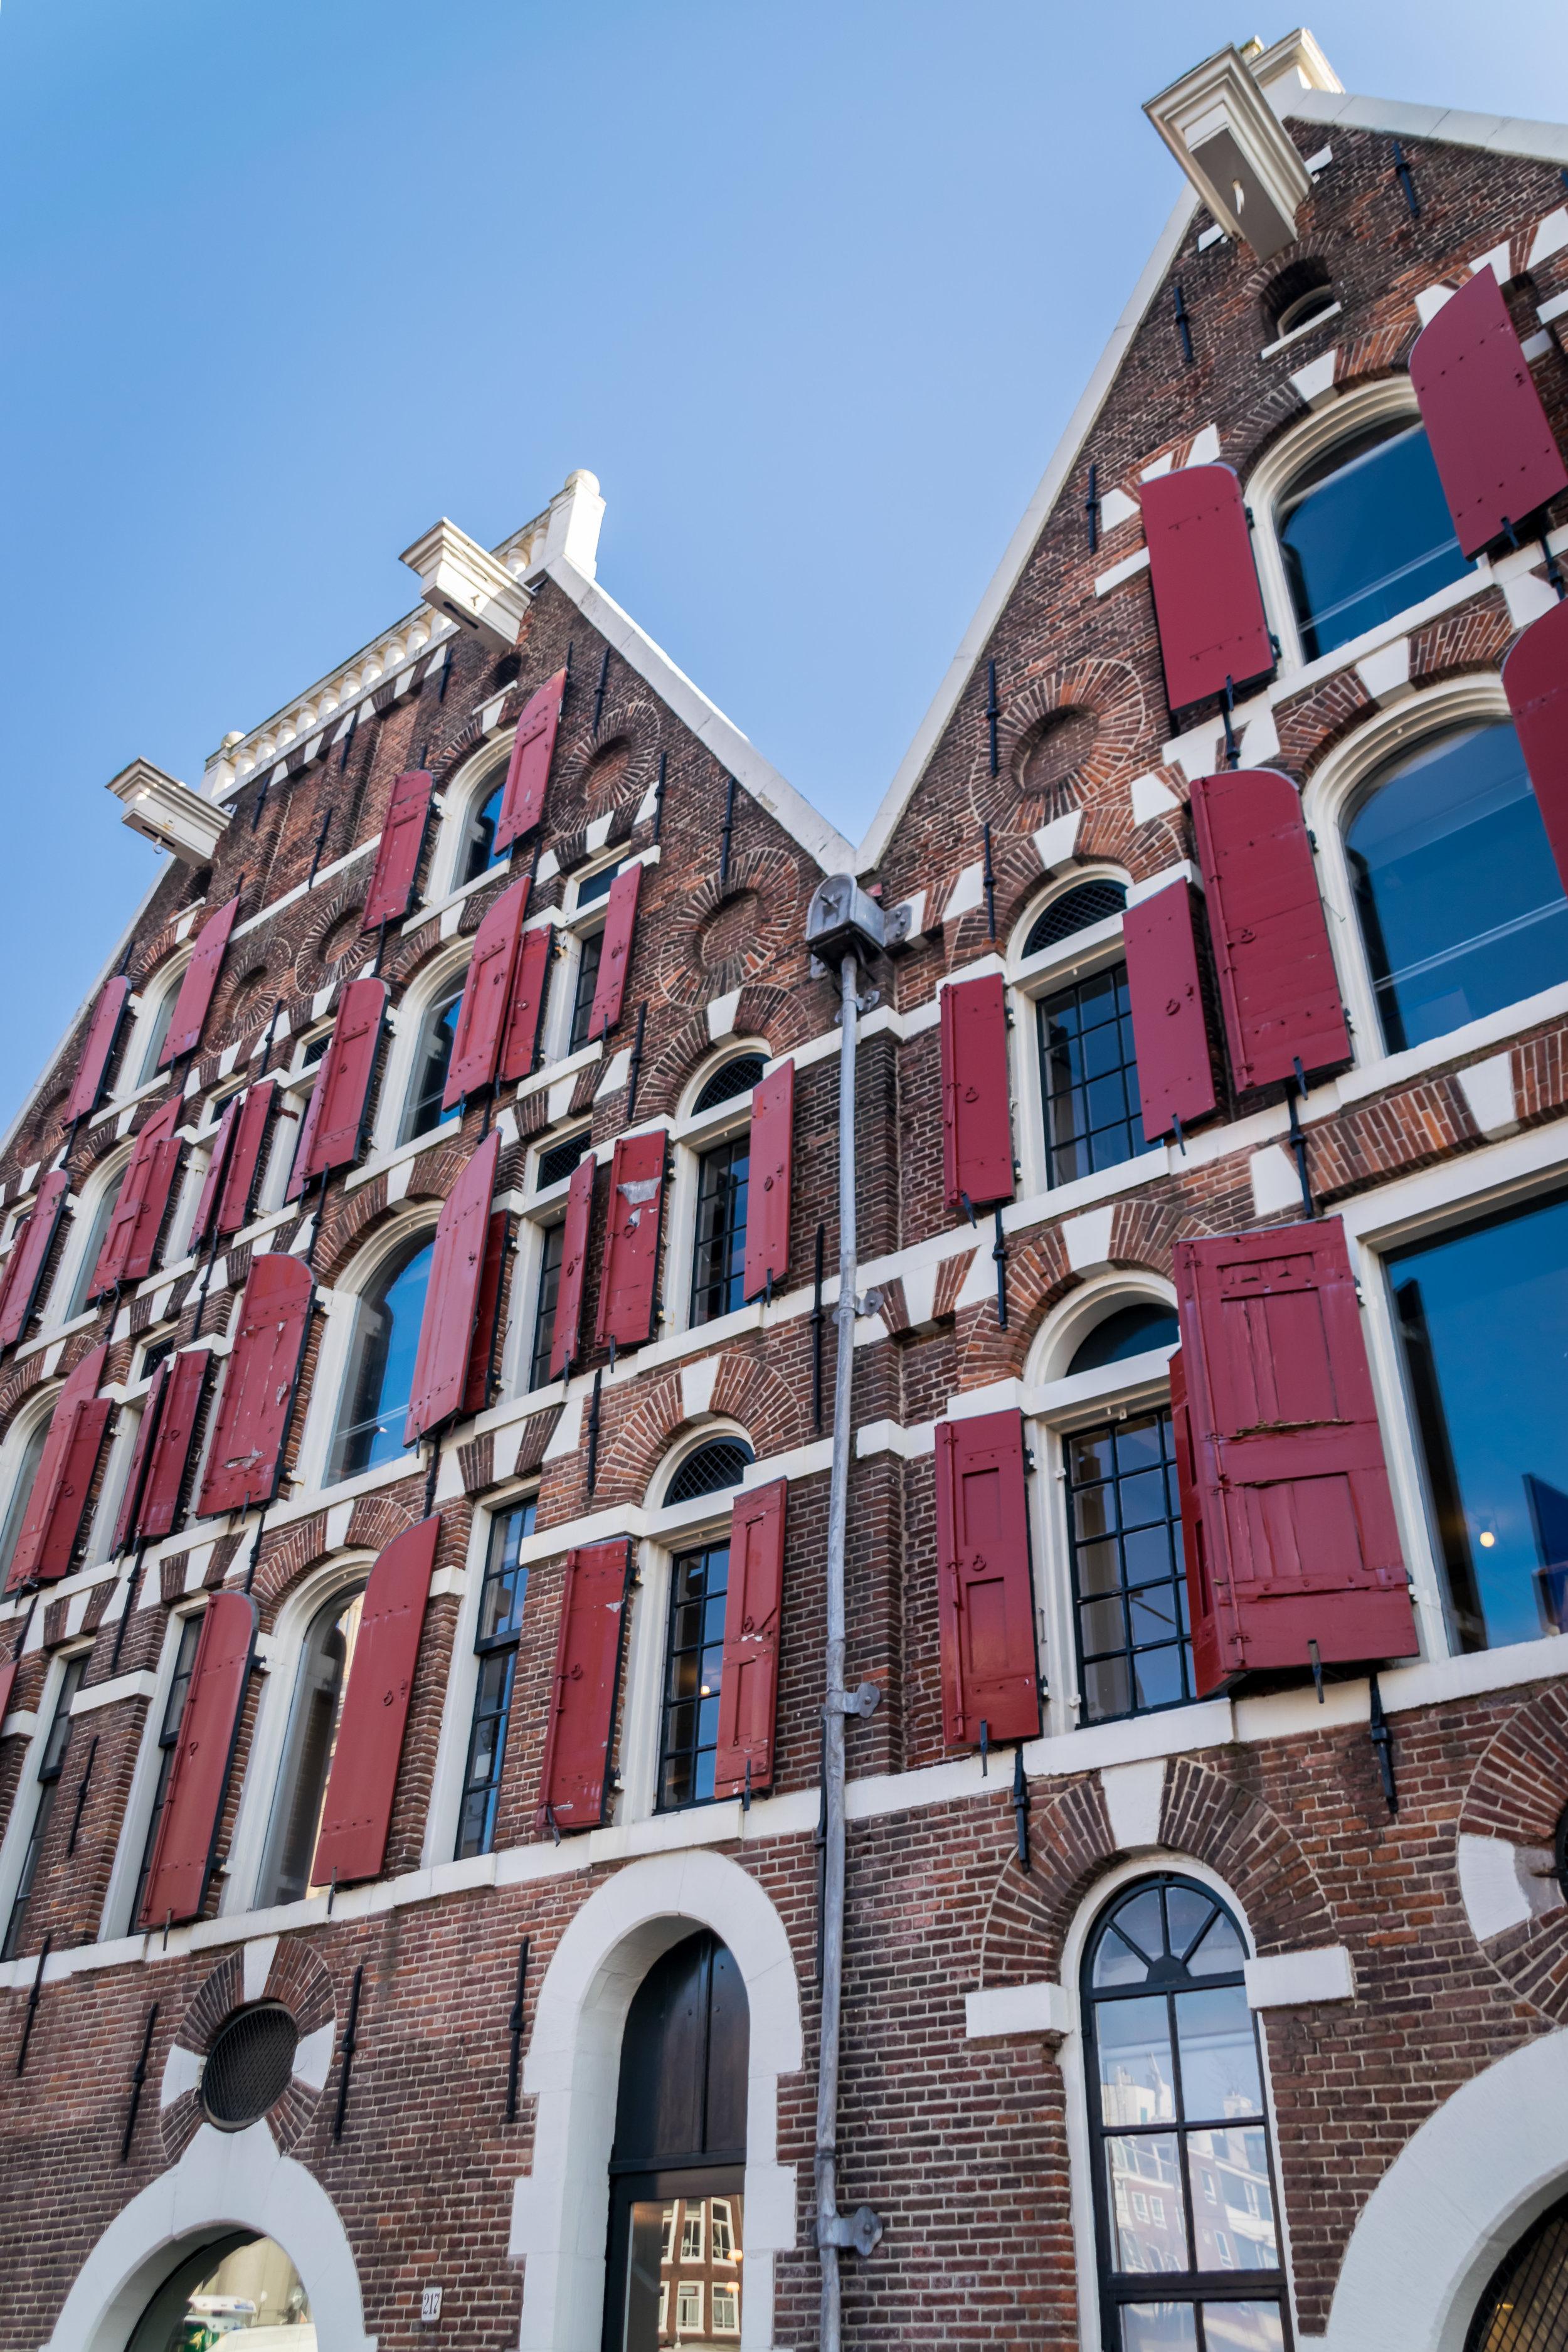 Amsterdam-6.jpg